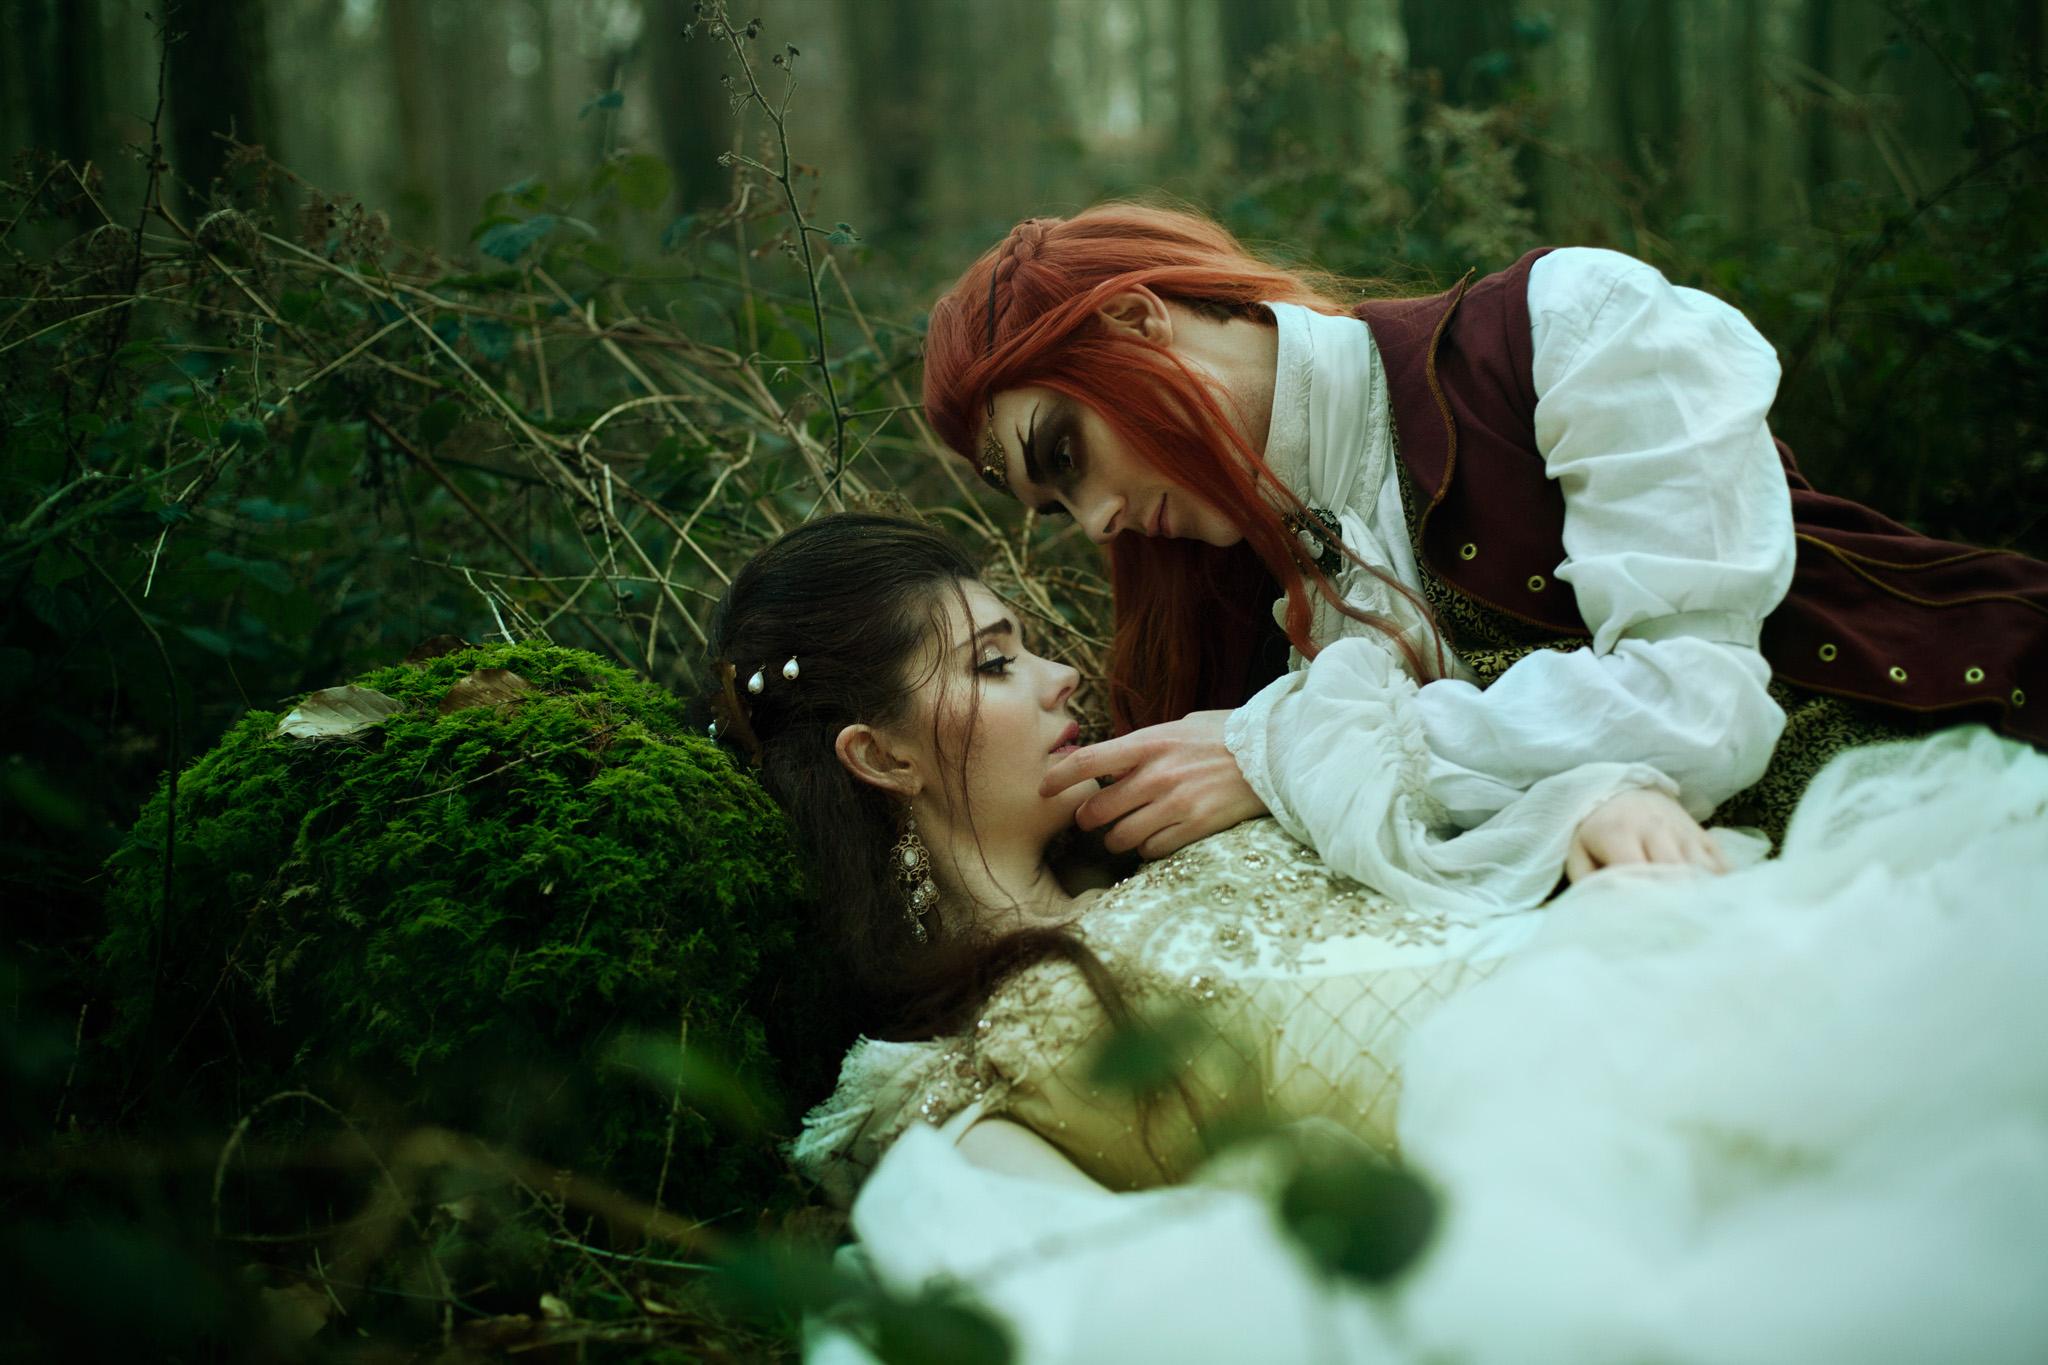 bella-kotak-fairytale-fairytales-labyrinth-david-bowie-sarah-beauty-beast-magic-magical-faerie-magazine-editorial-firefly-path-twilight-woods-lantern-ethereal-fairy-disney-ian-hencher-8s.jpg